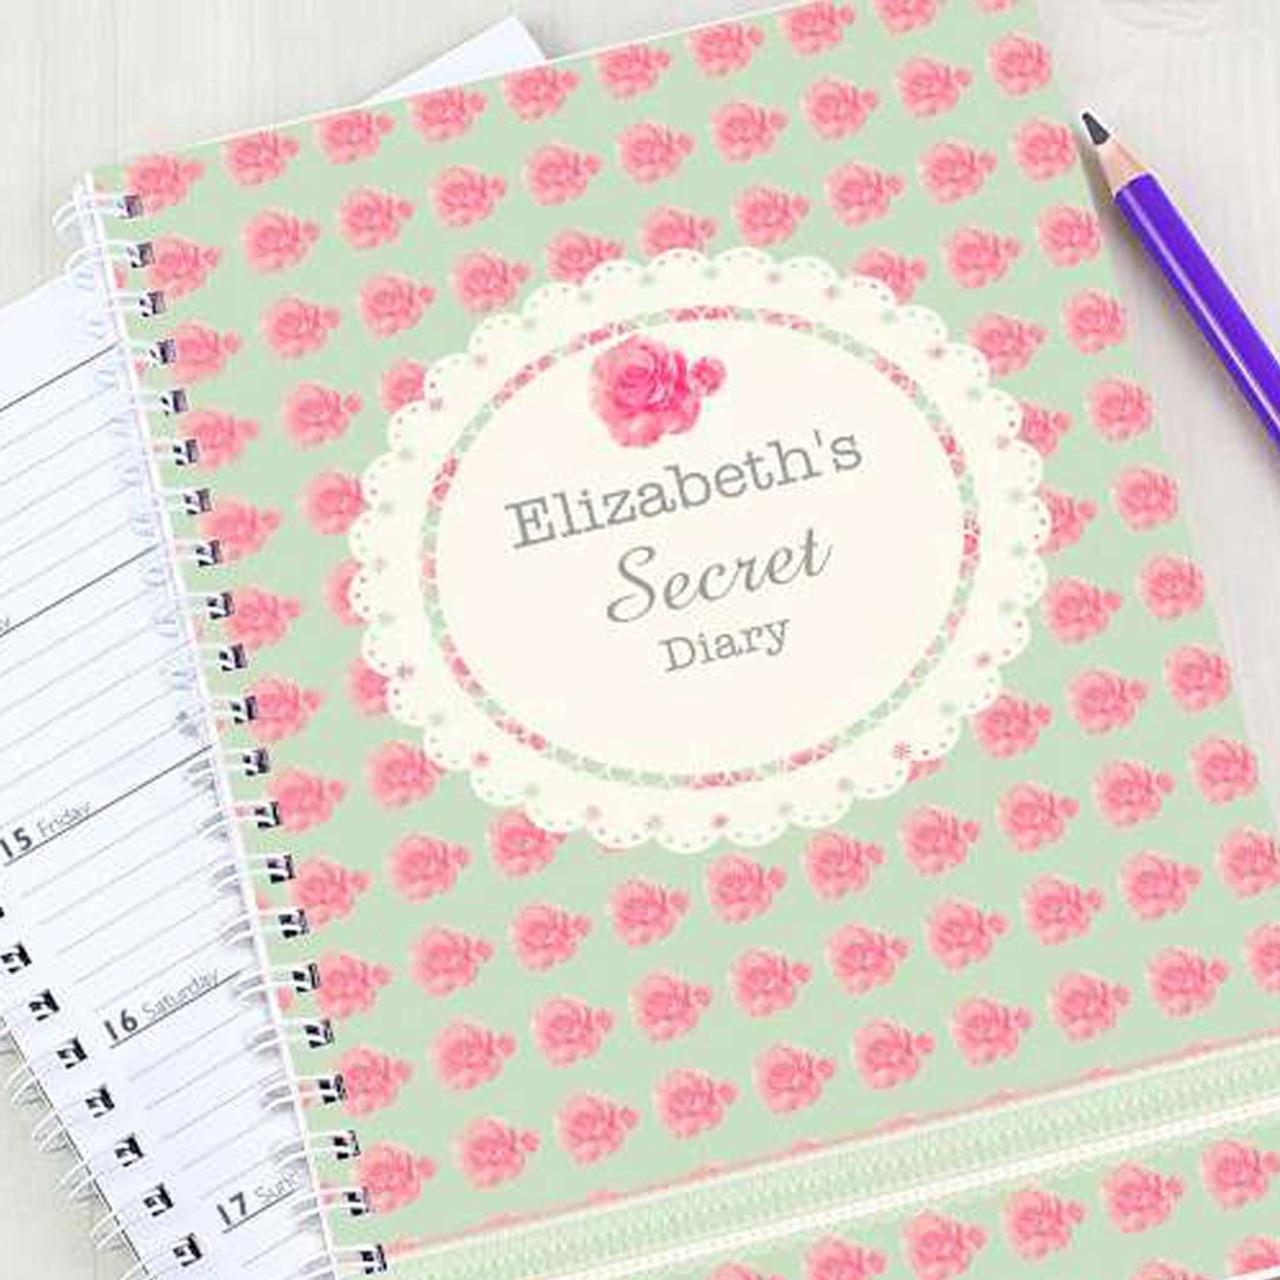 Diaries & Notebooks